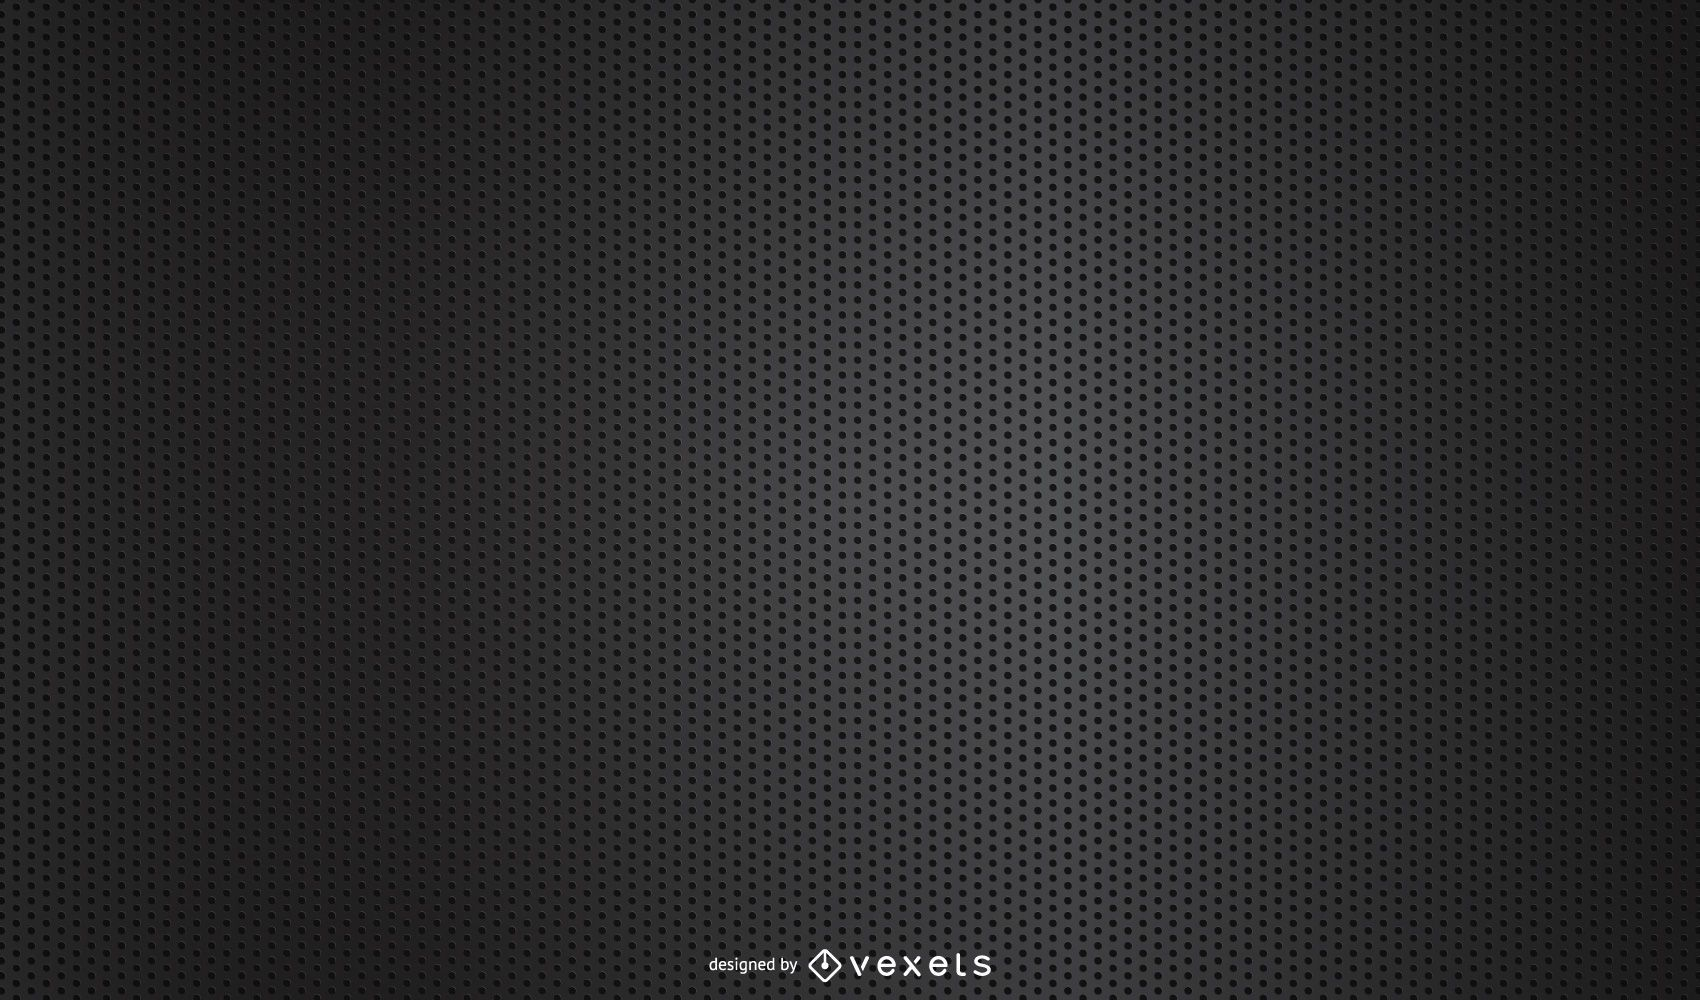 Vektor-Grill-Textur